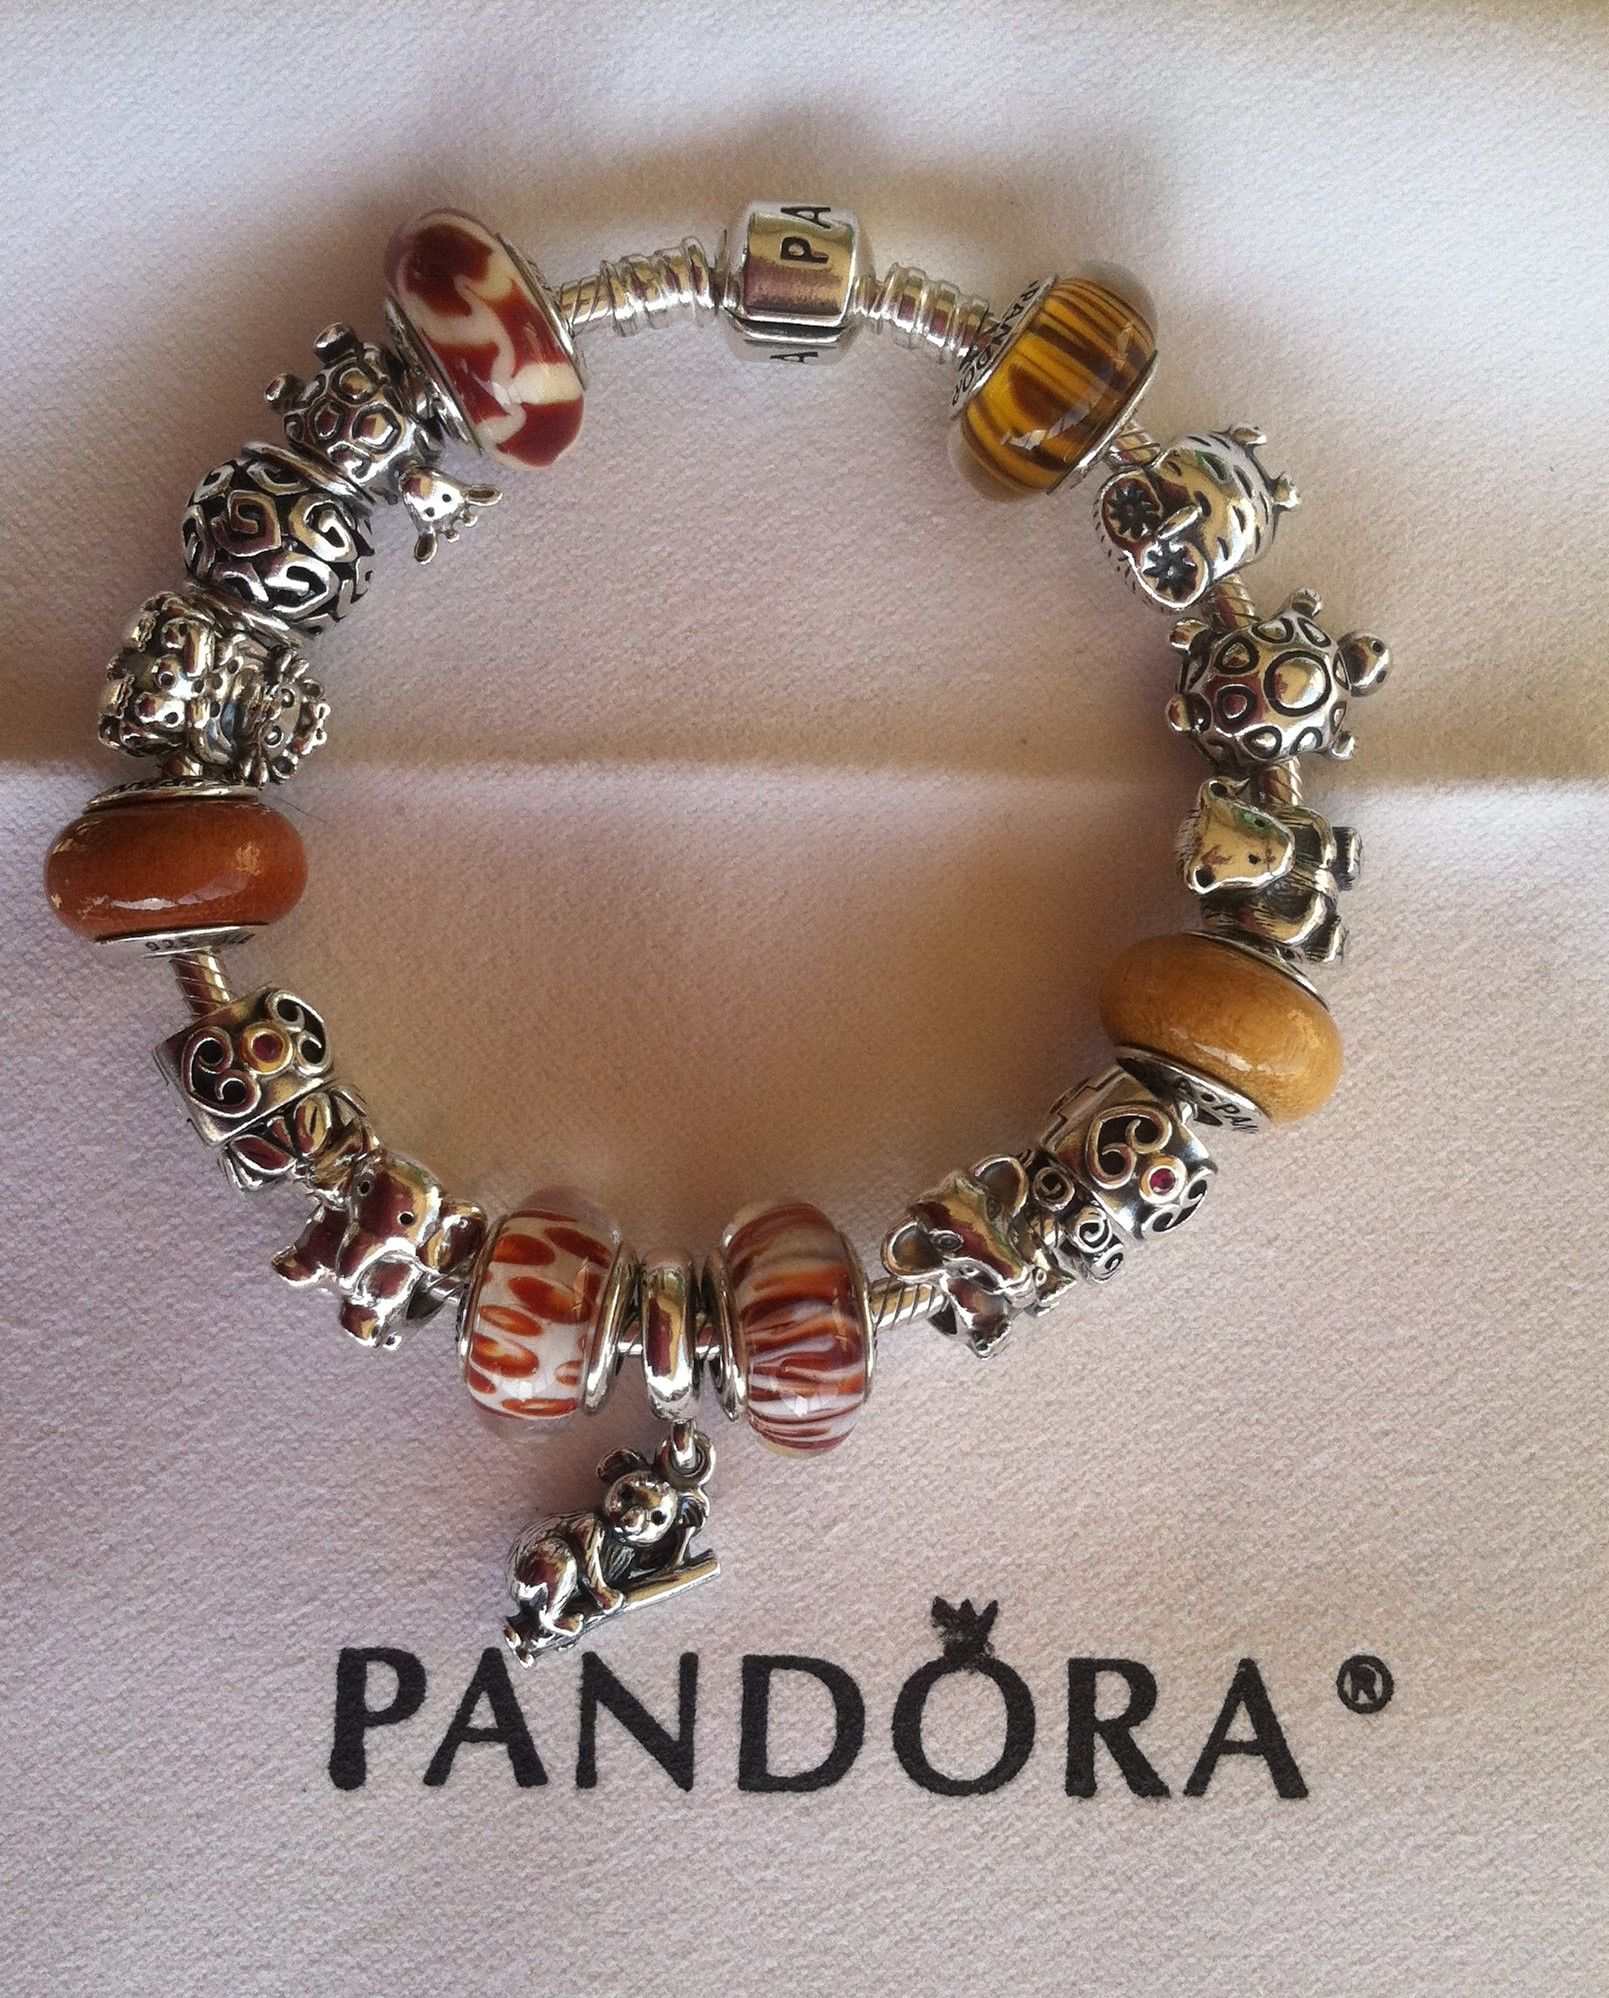 Pandora Safari Charm Bracelet